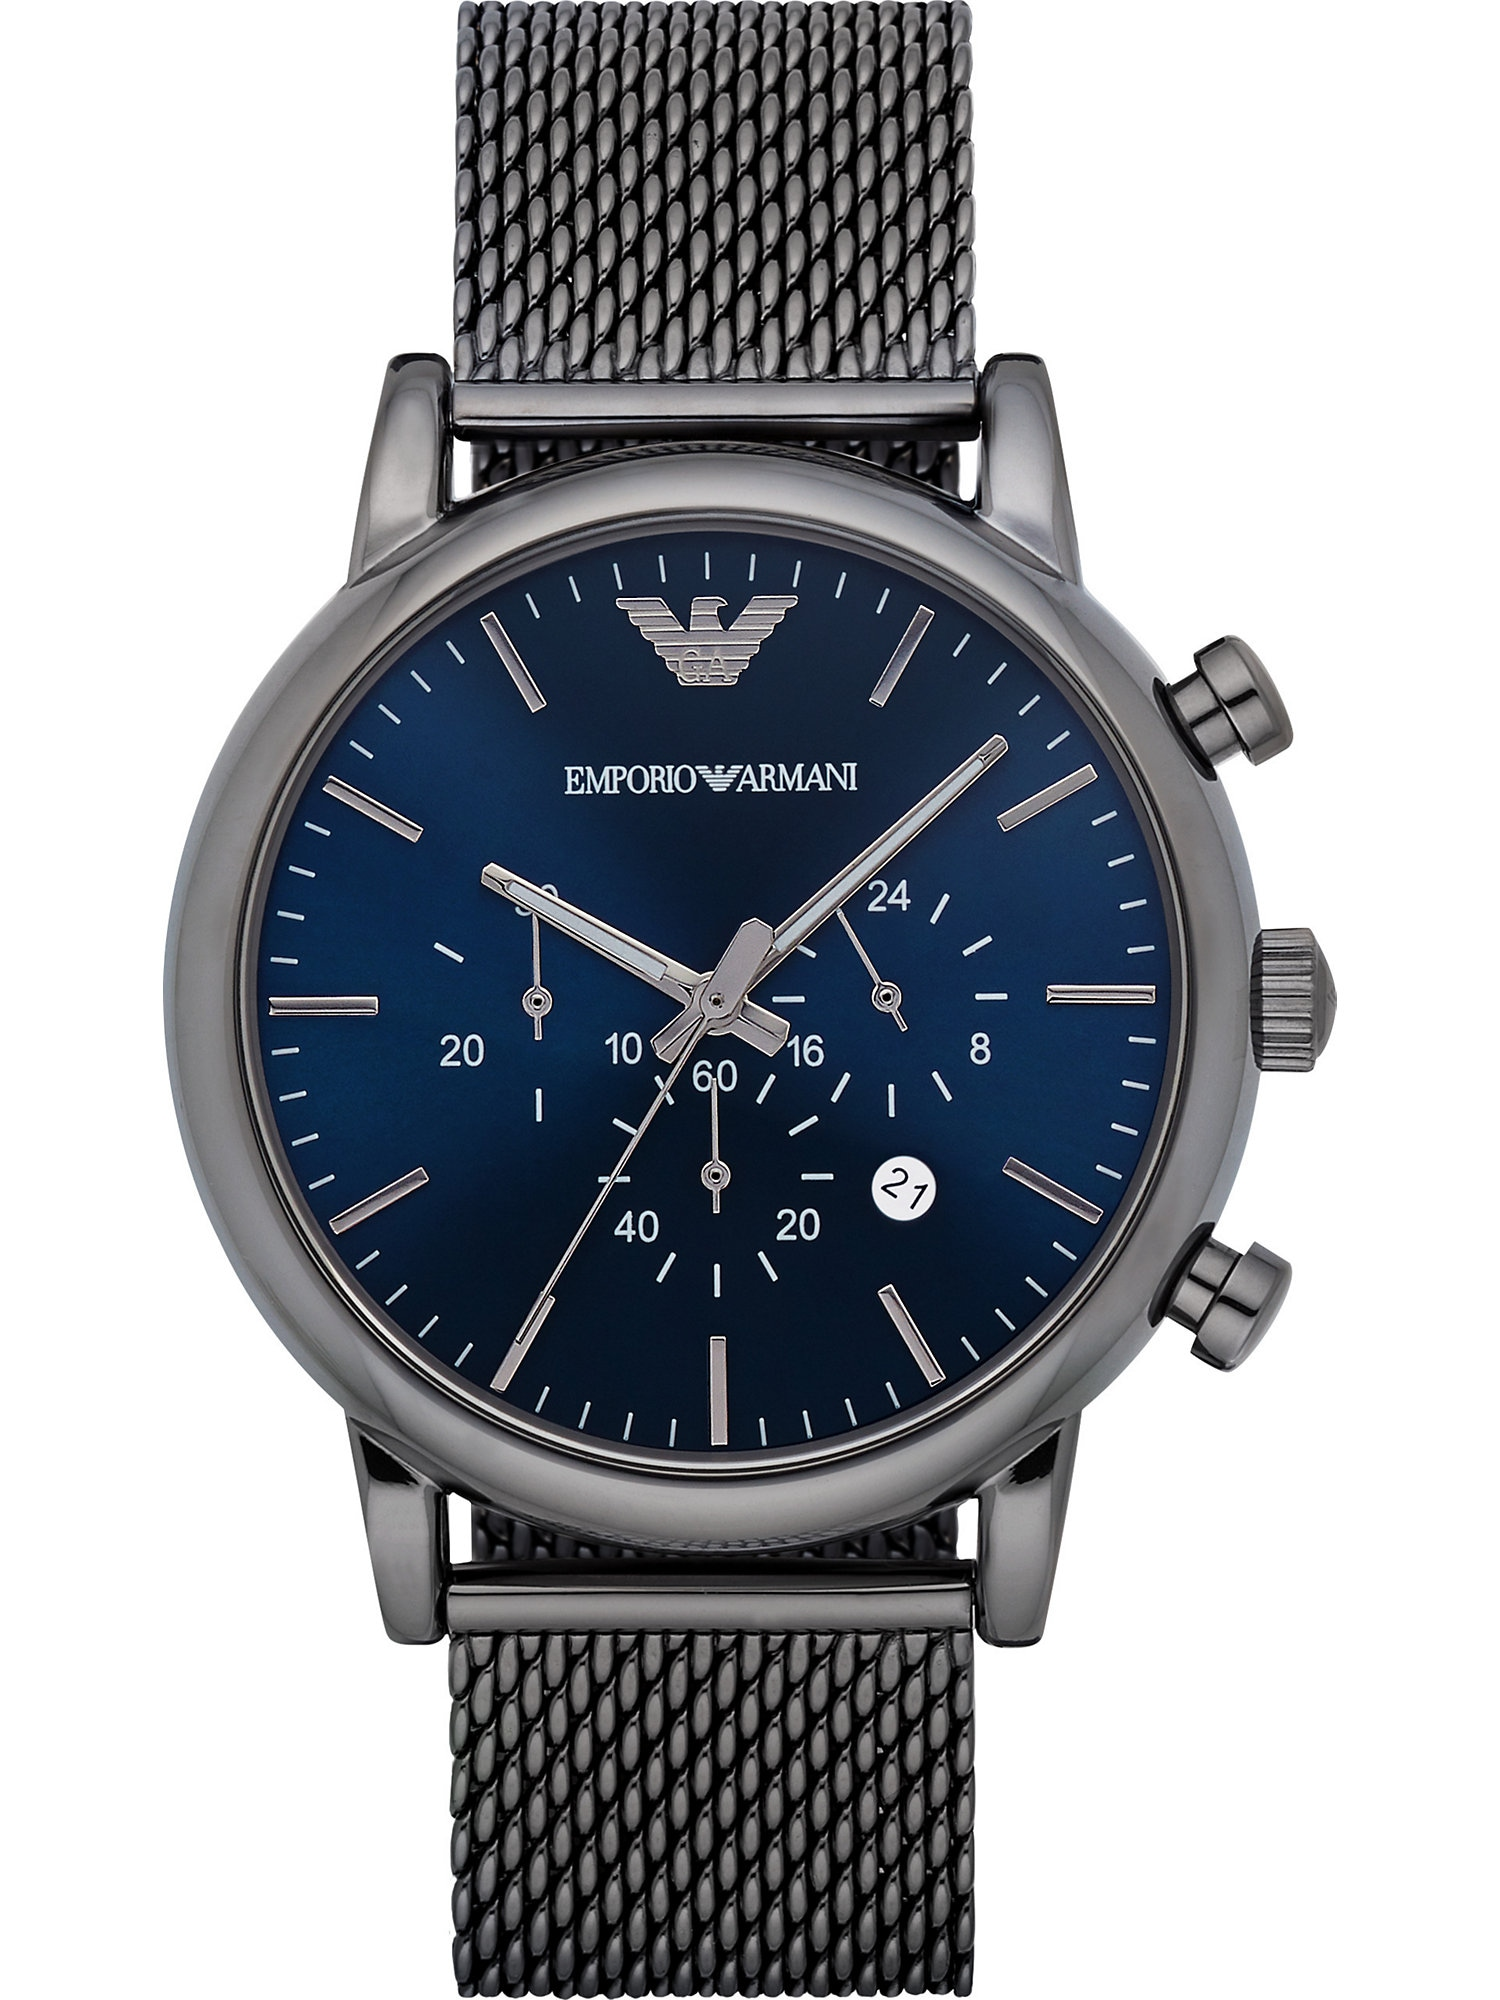 Armbanduhr mit Chronograph | Uhren > Sonstige Armbanduhren | Emporio Armani